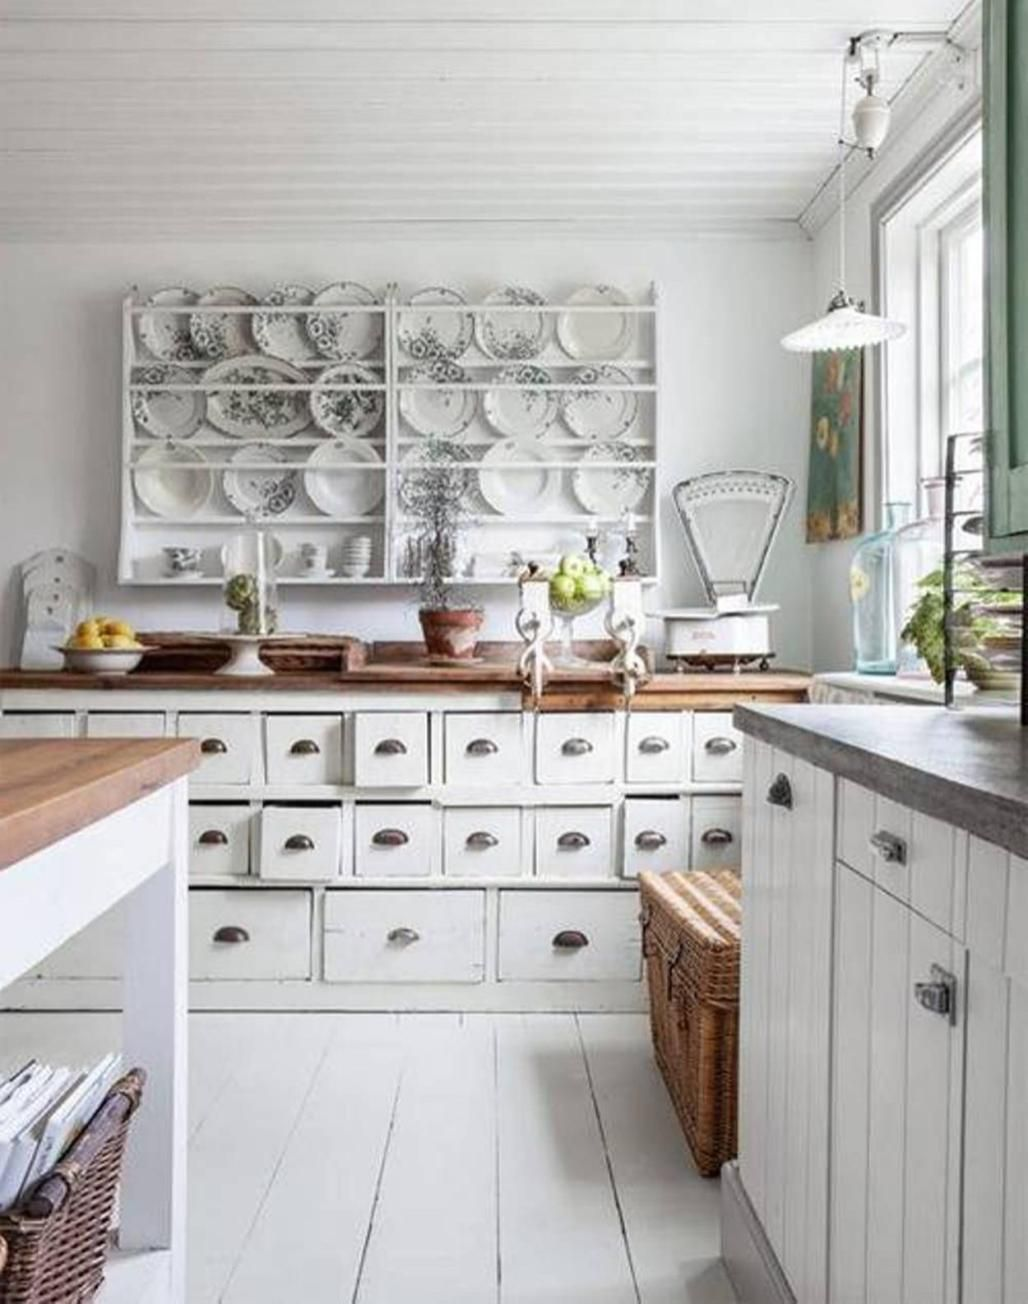 58 Vintage Shabby Chic Kitchen Cabinets Ideas Shabby Chic Kitchen Cabinets Shabby Chic Kitchen Decor Shabby Chic Kitchen